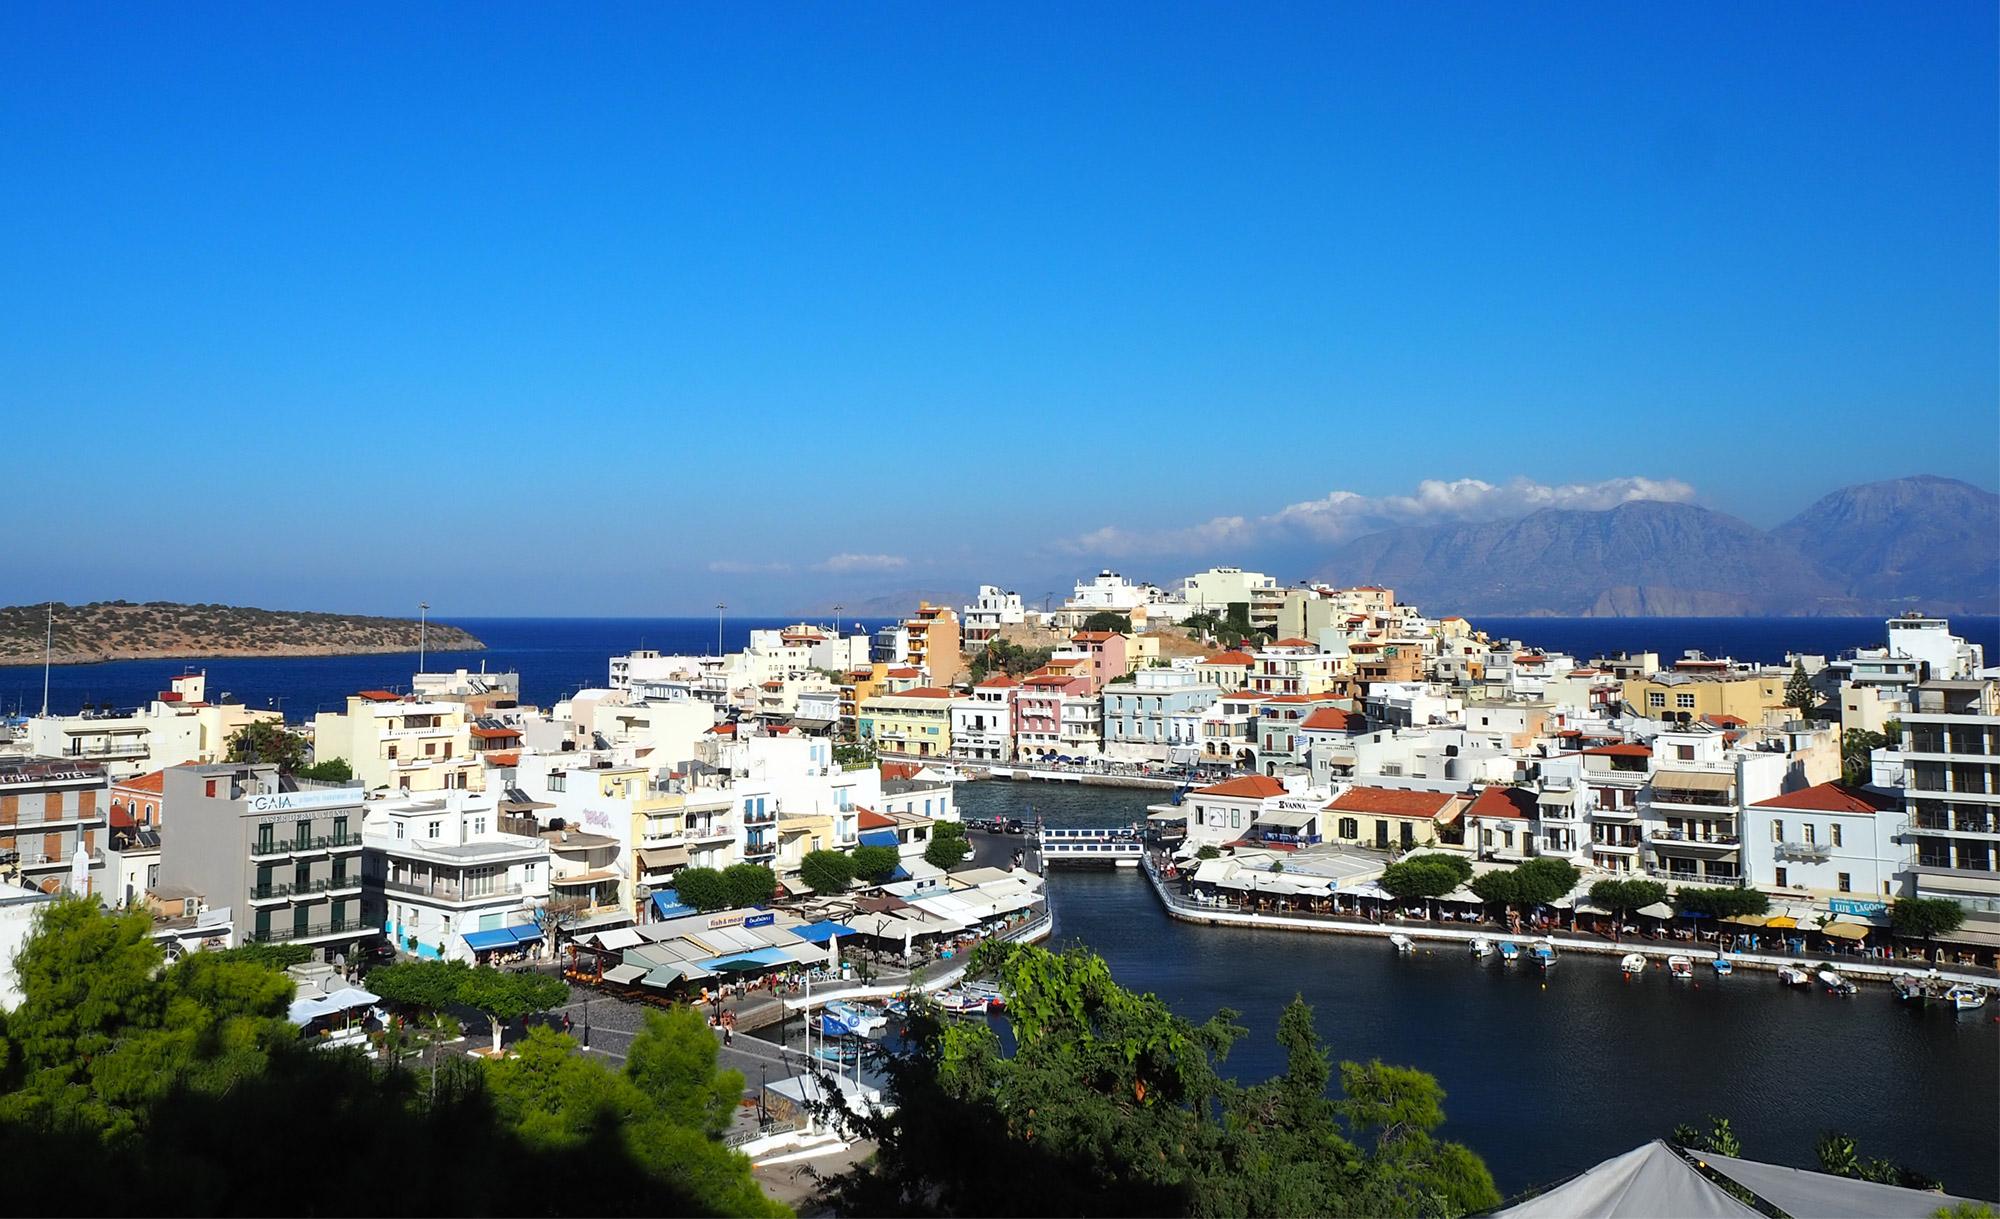 Das ehemalige Fischerdorf Agios Nikolaos